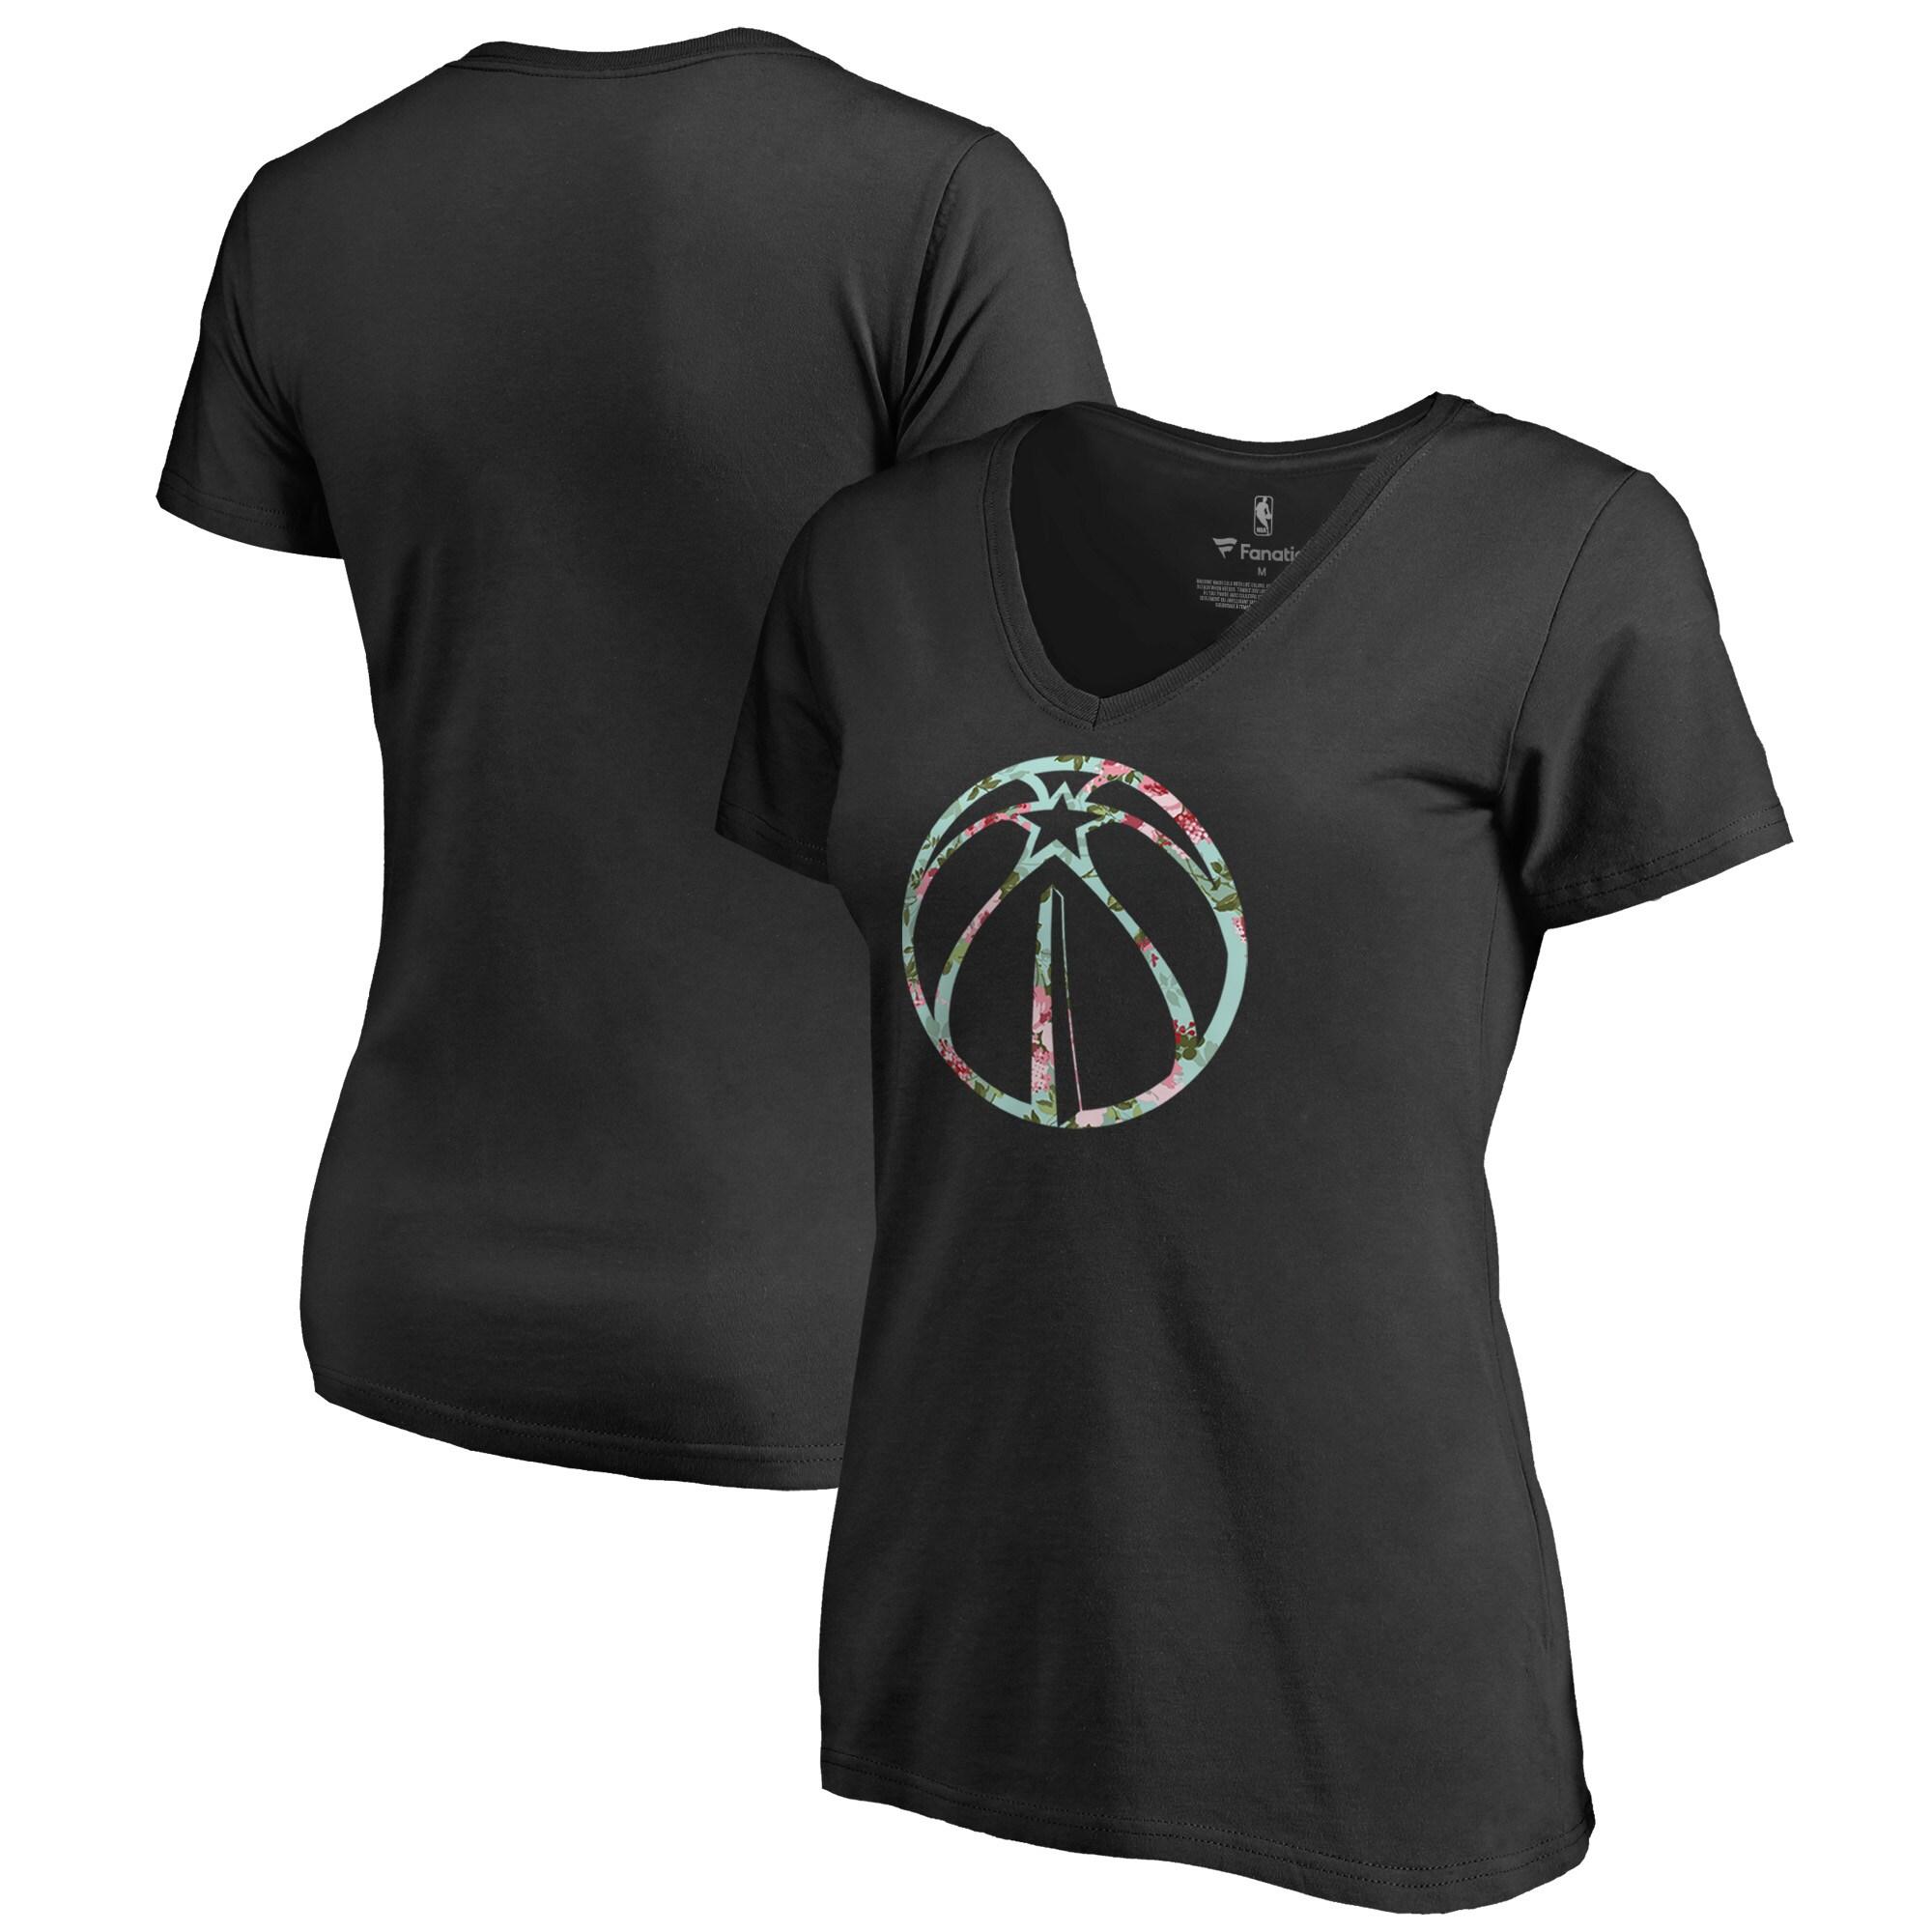 Washington Wizards Fanatics Branded Women's Lovely Plus Size V-Neck T-Shirt - Black